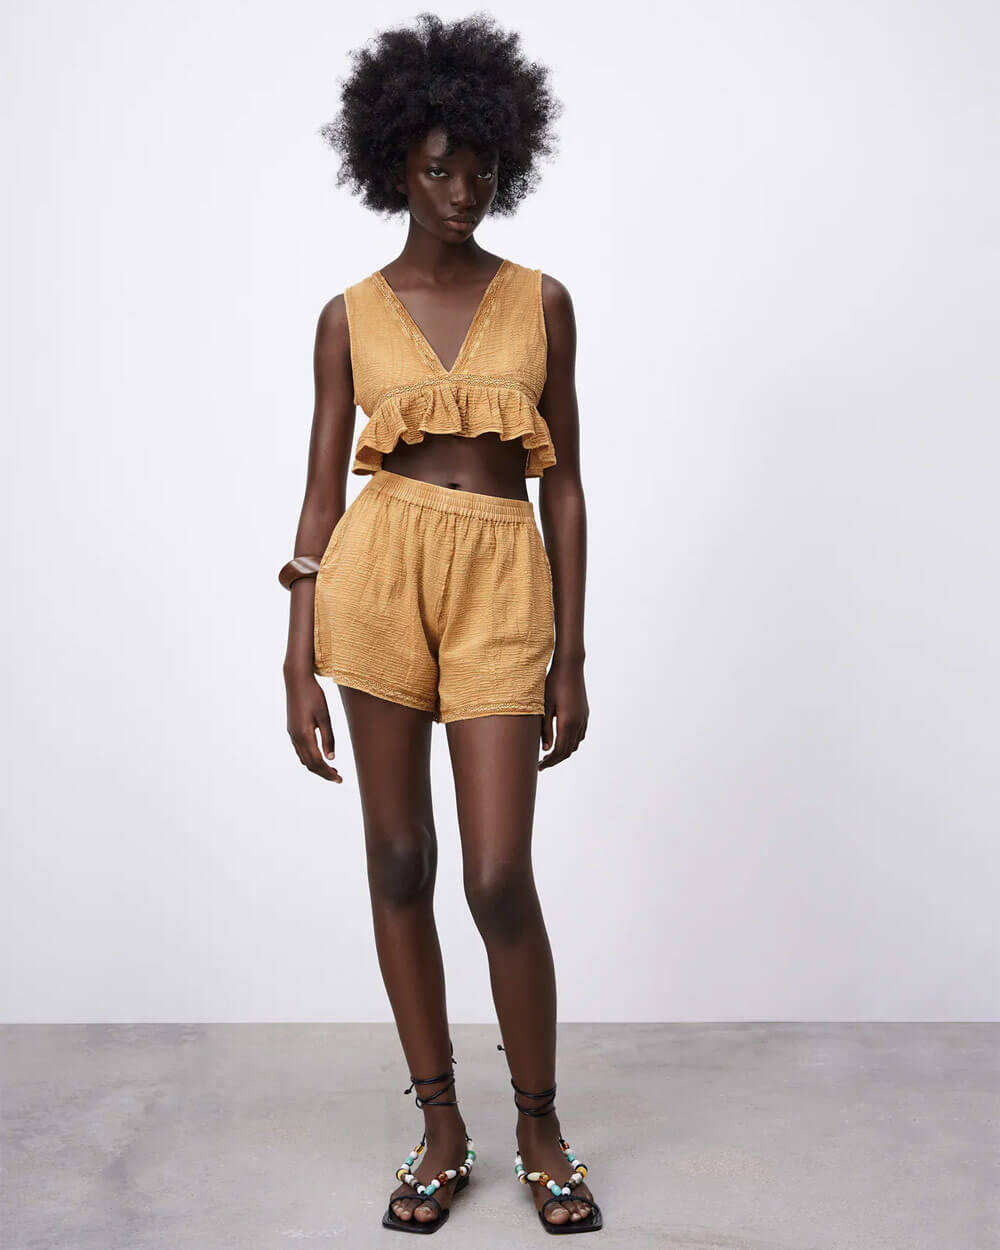 Zara boho clothing stores like Anthropologie